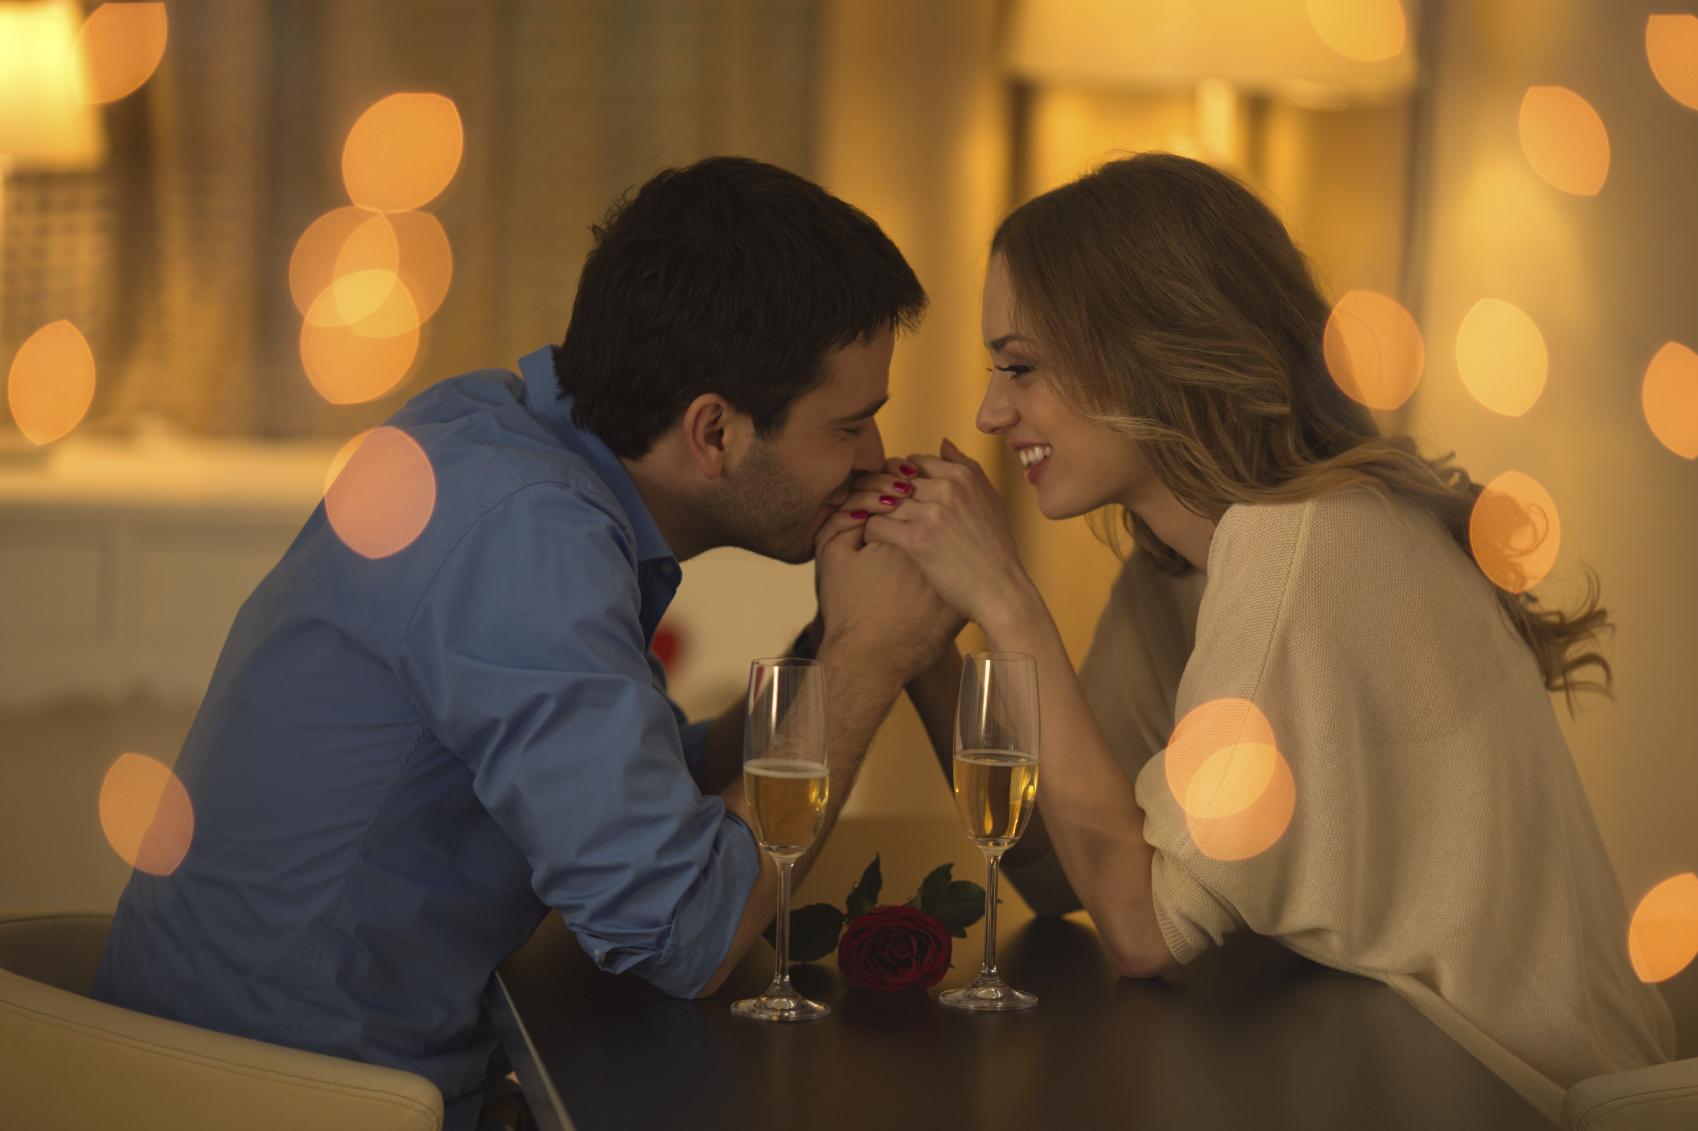 Imagini pentru relationship couple images